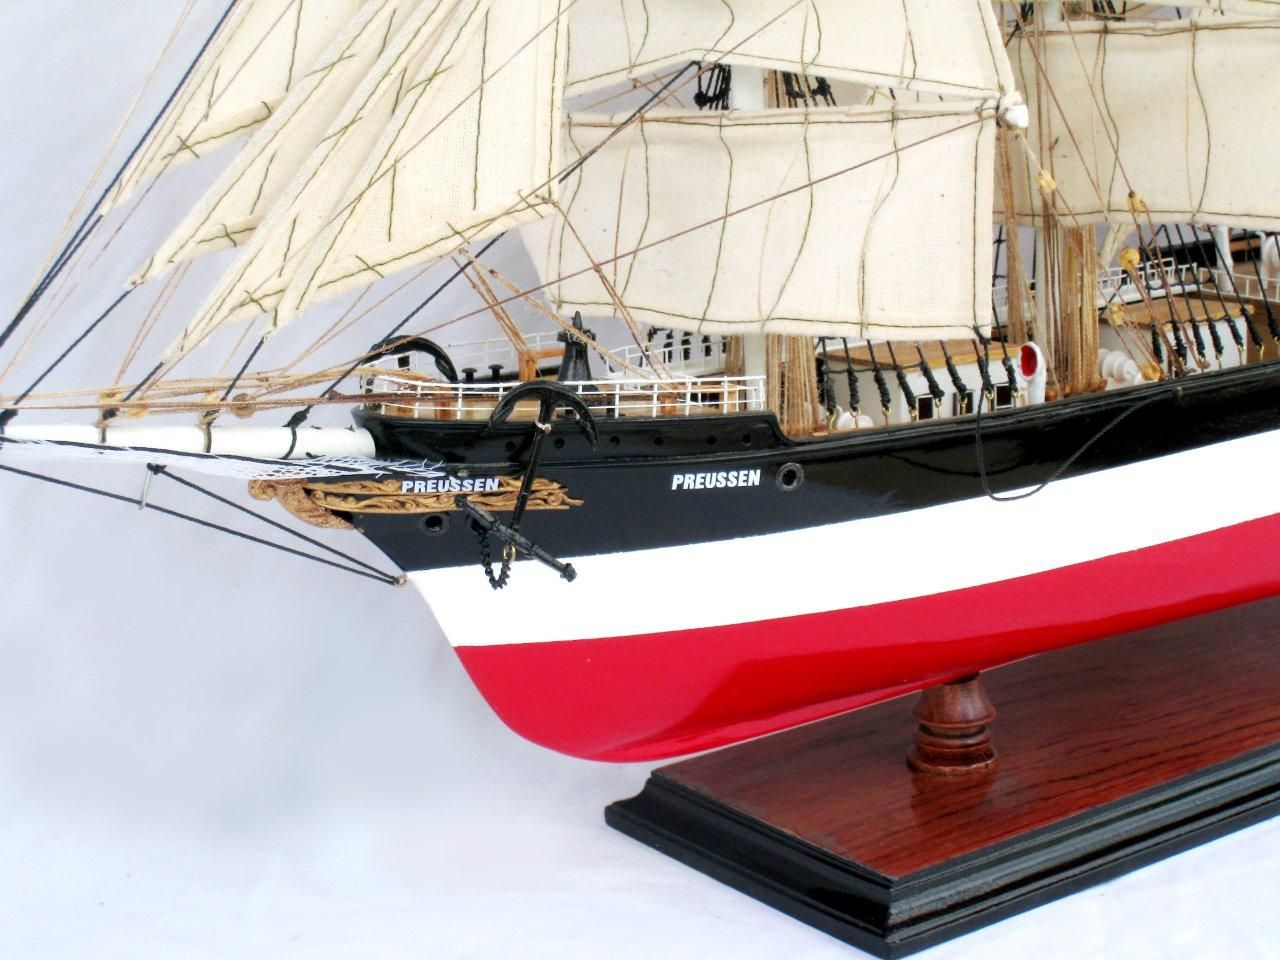 2086-12581-Preussen-Model-Boat